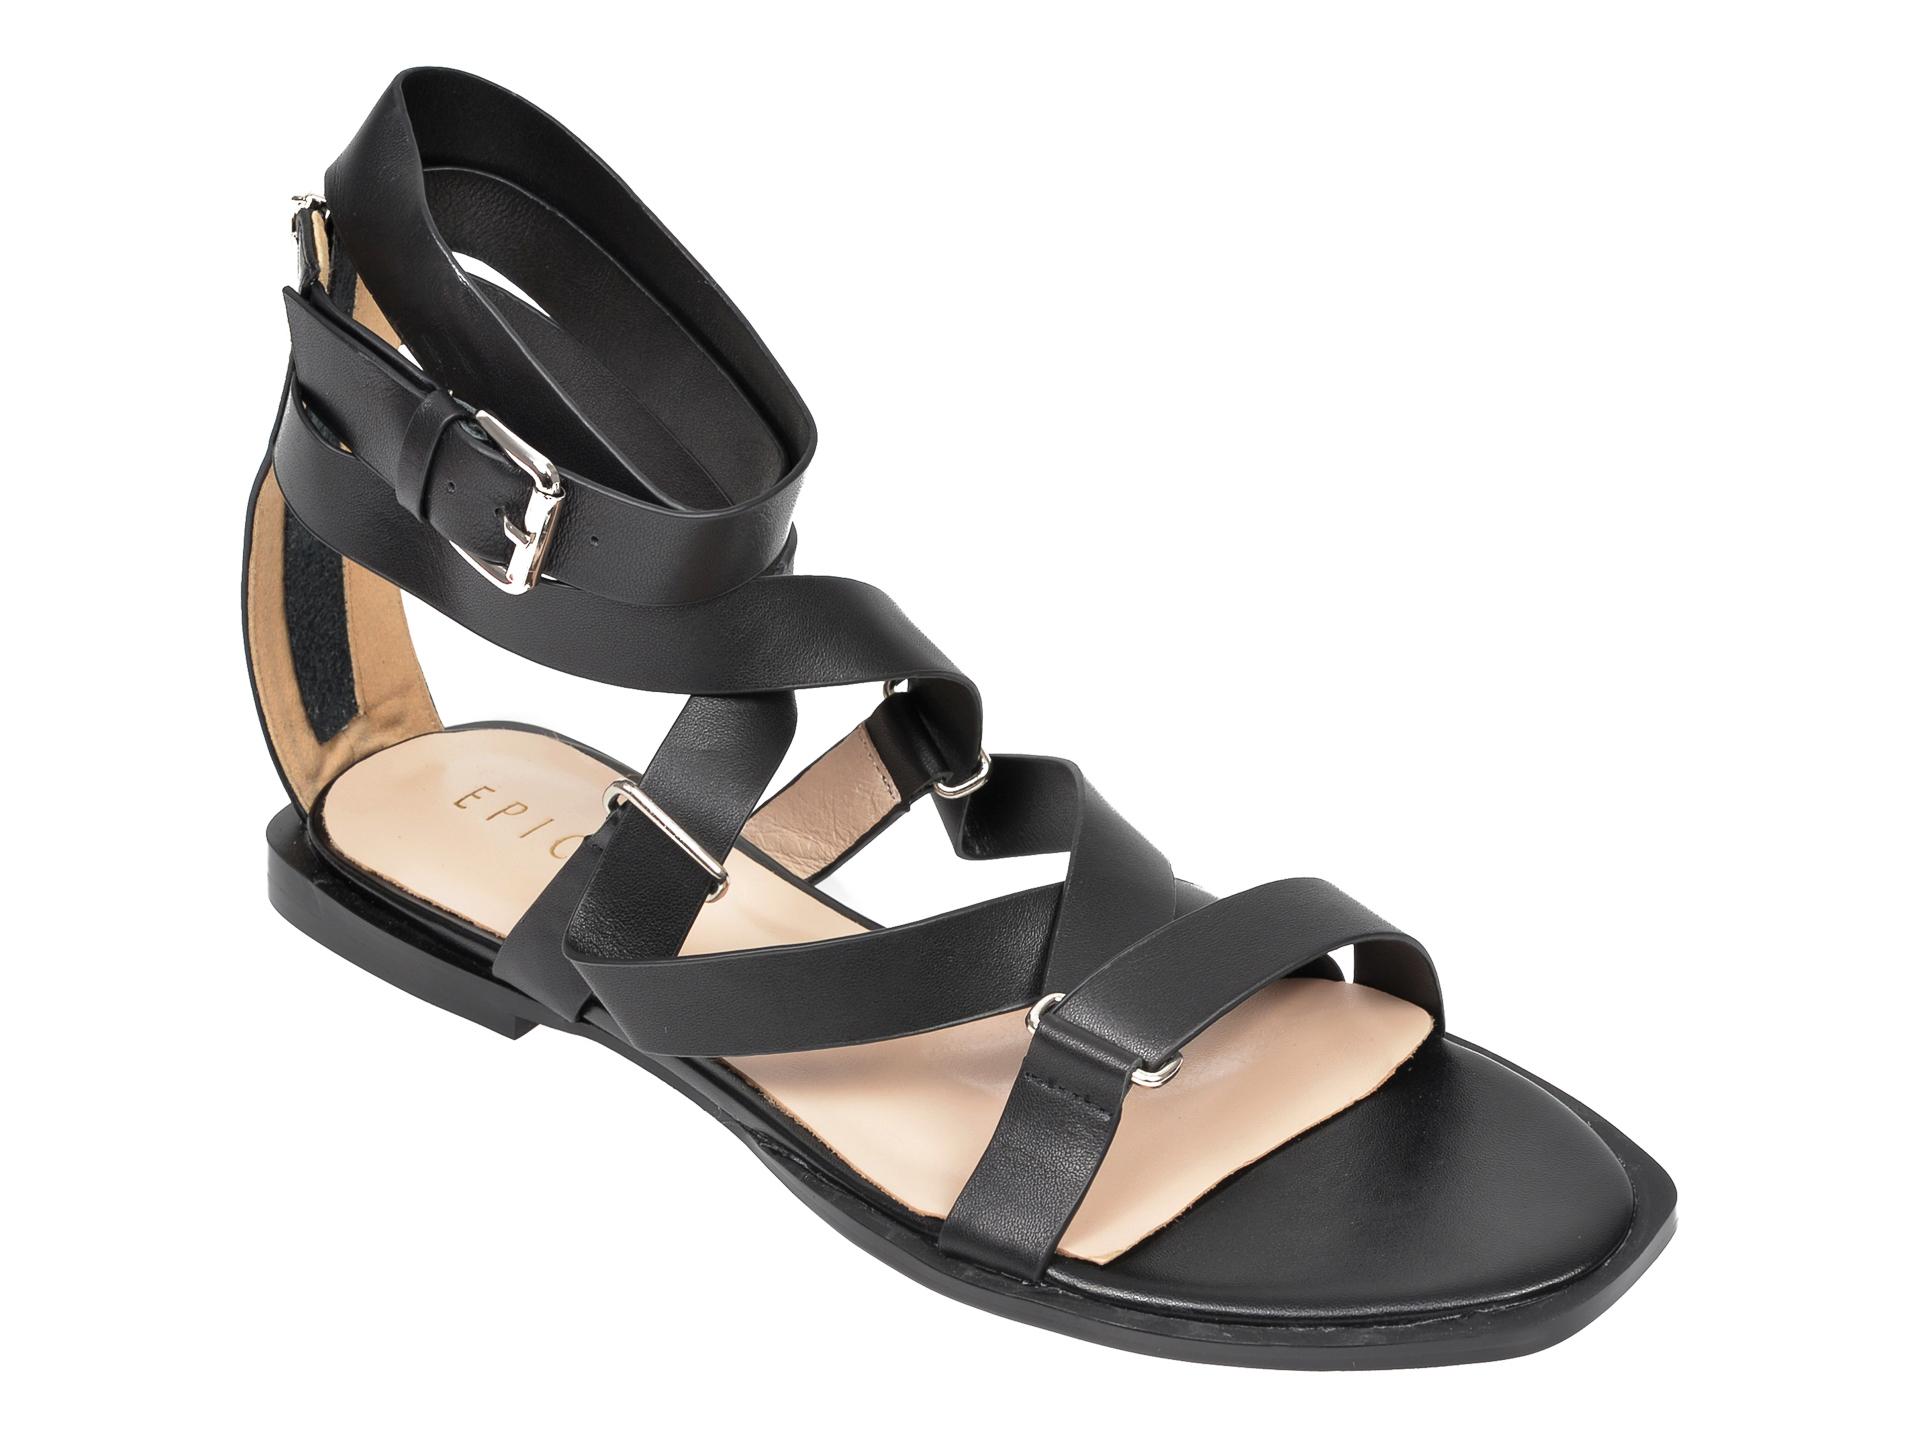 Sandale EPICA negre, NW9828N, din piele naturala